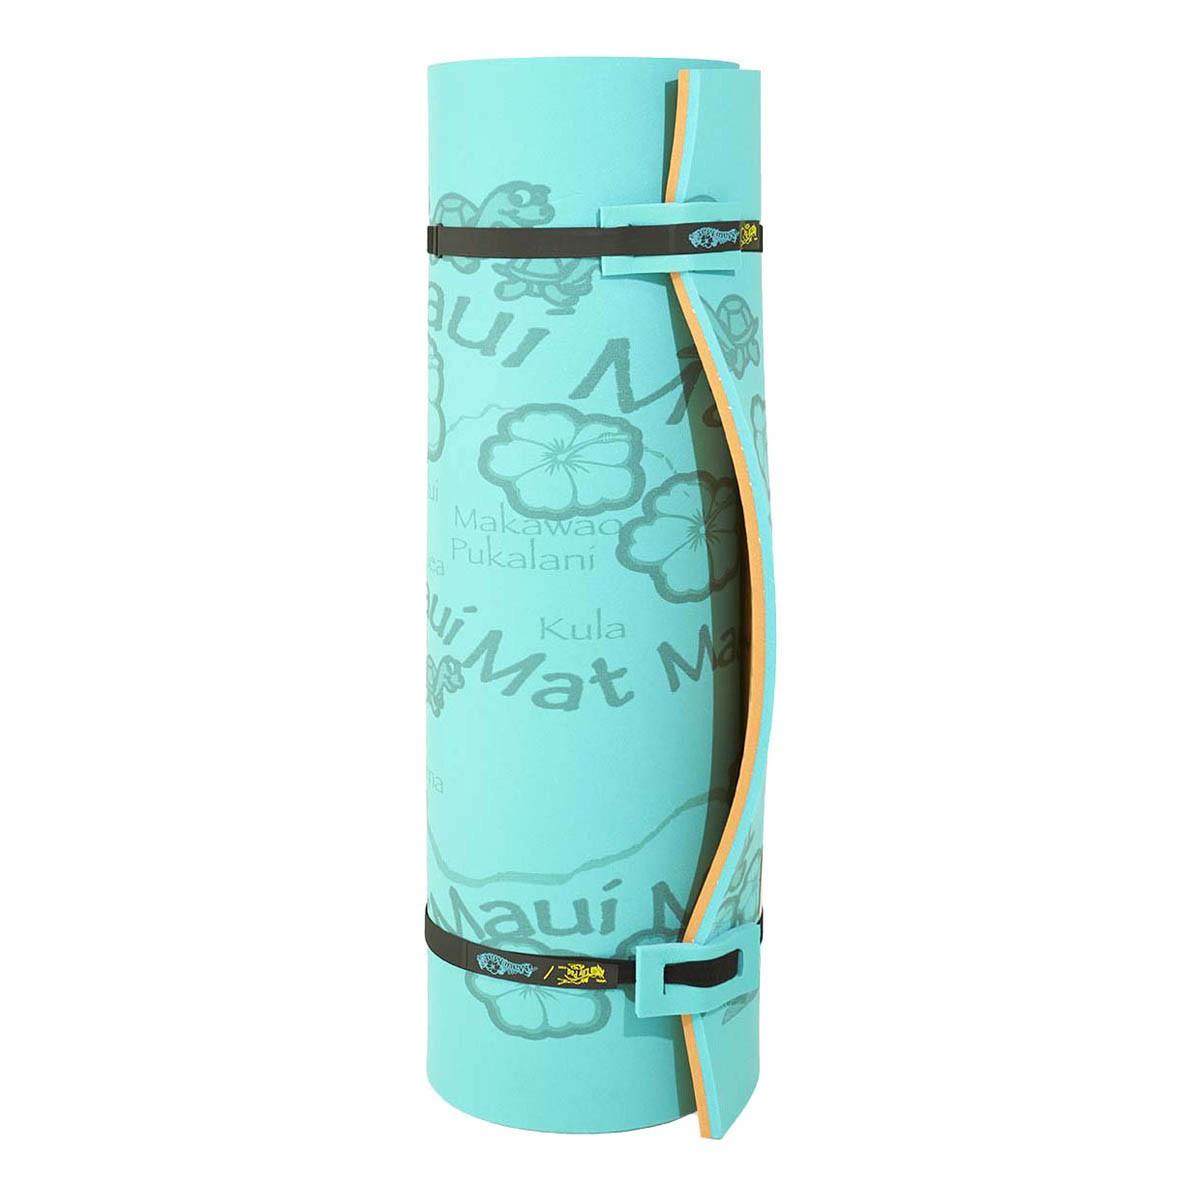 "Aqua Lily Maui Mat Pad - 20' x 6' x 1 3/8"""